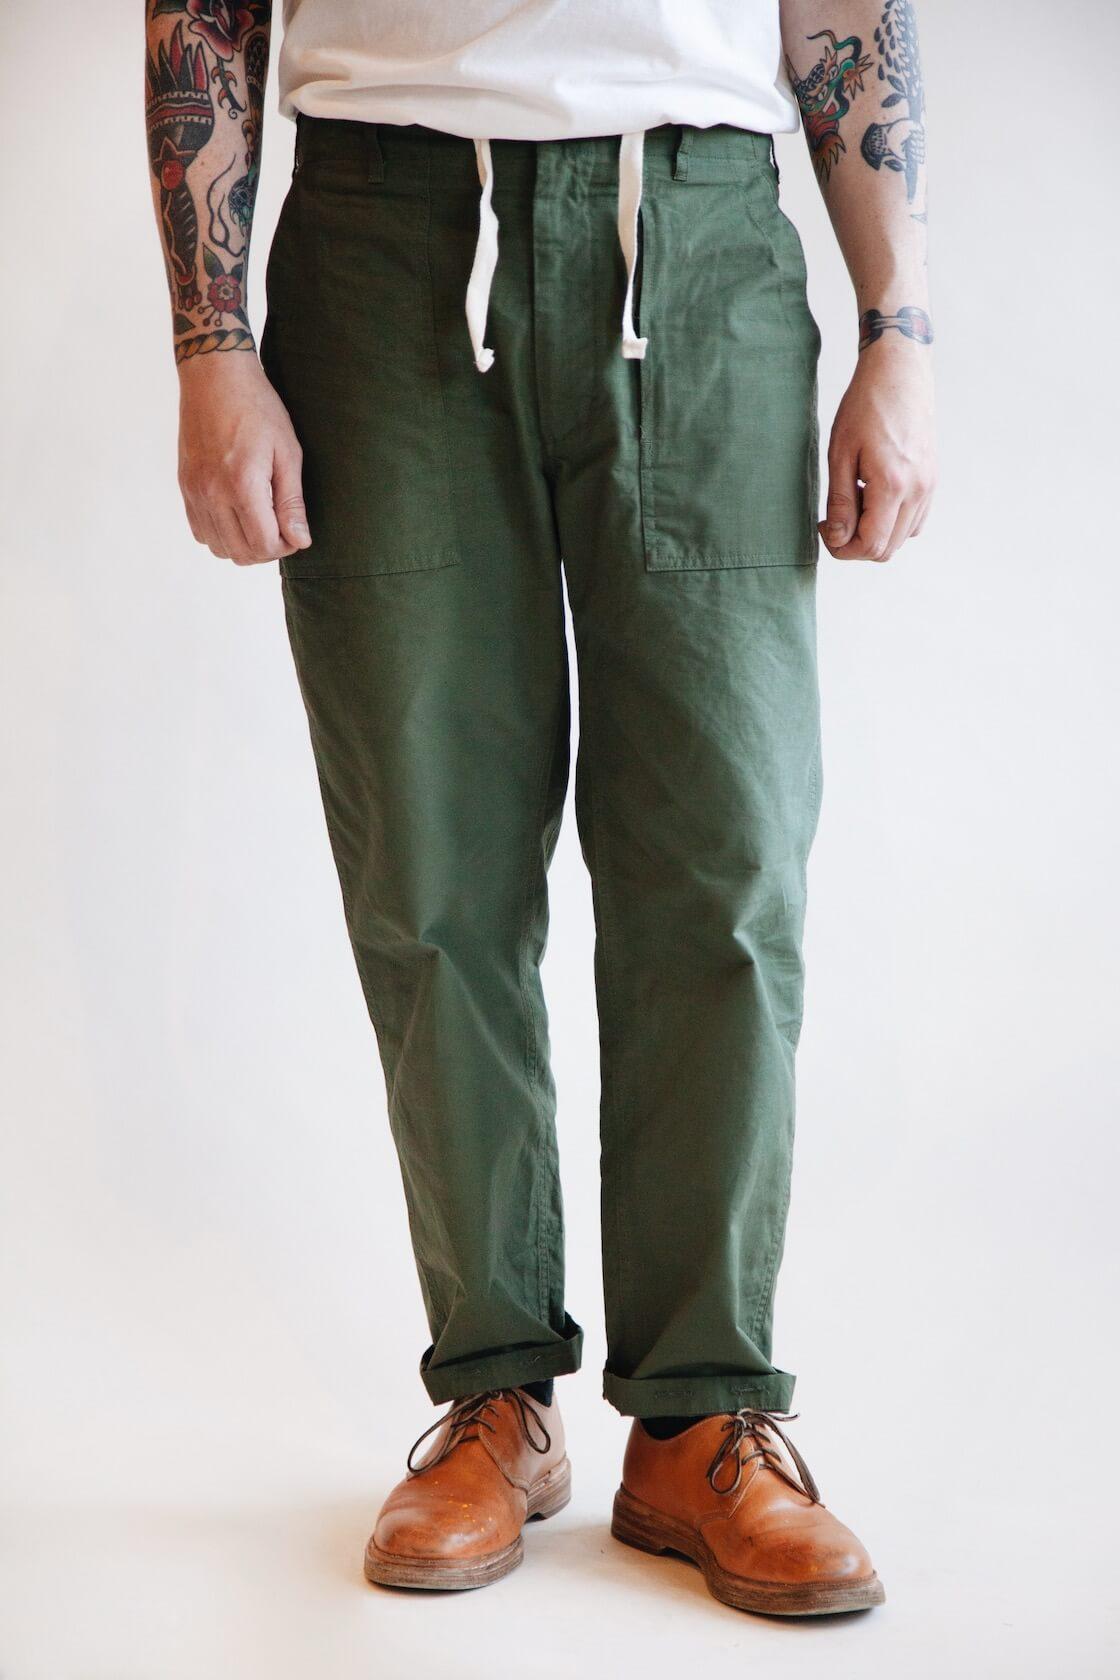 engineered garments fatigue pants on body